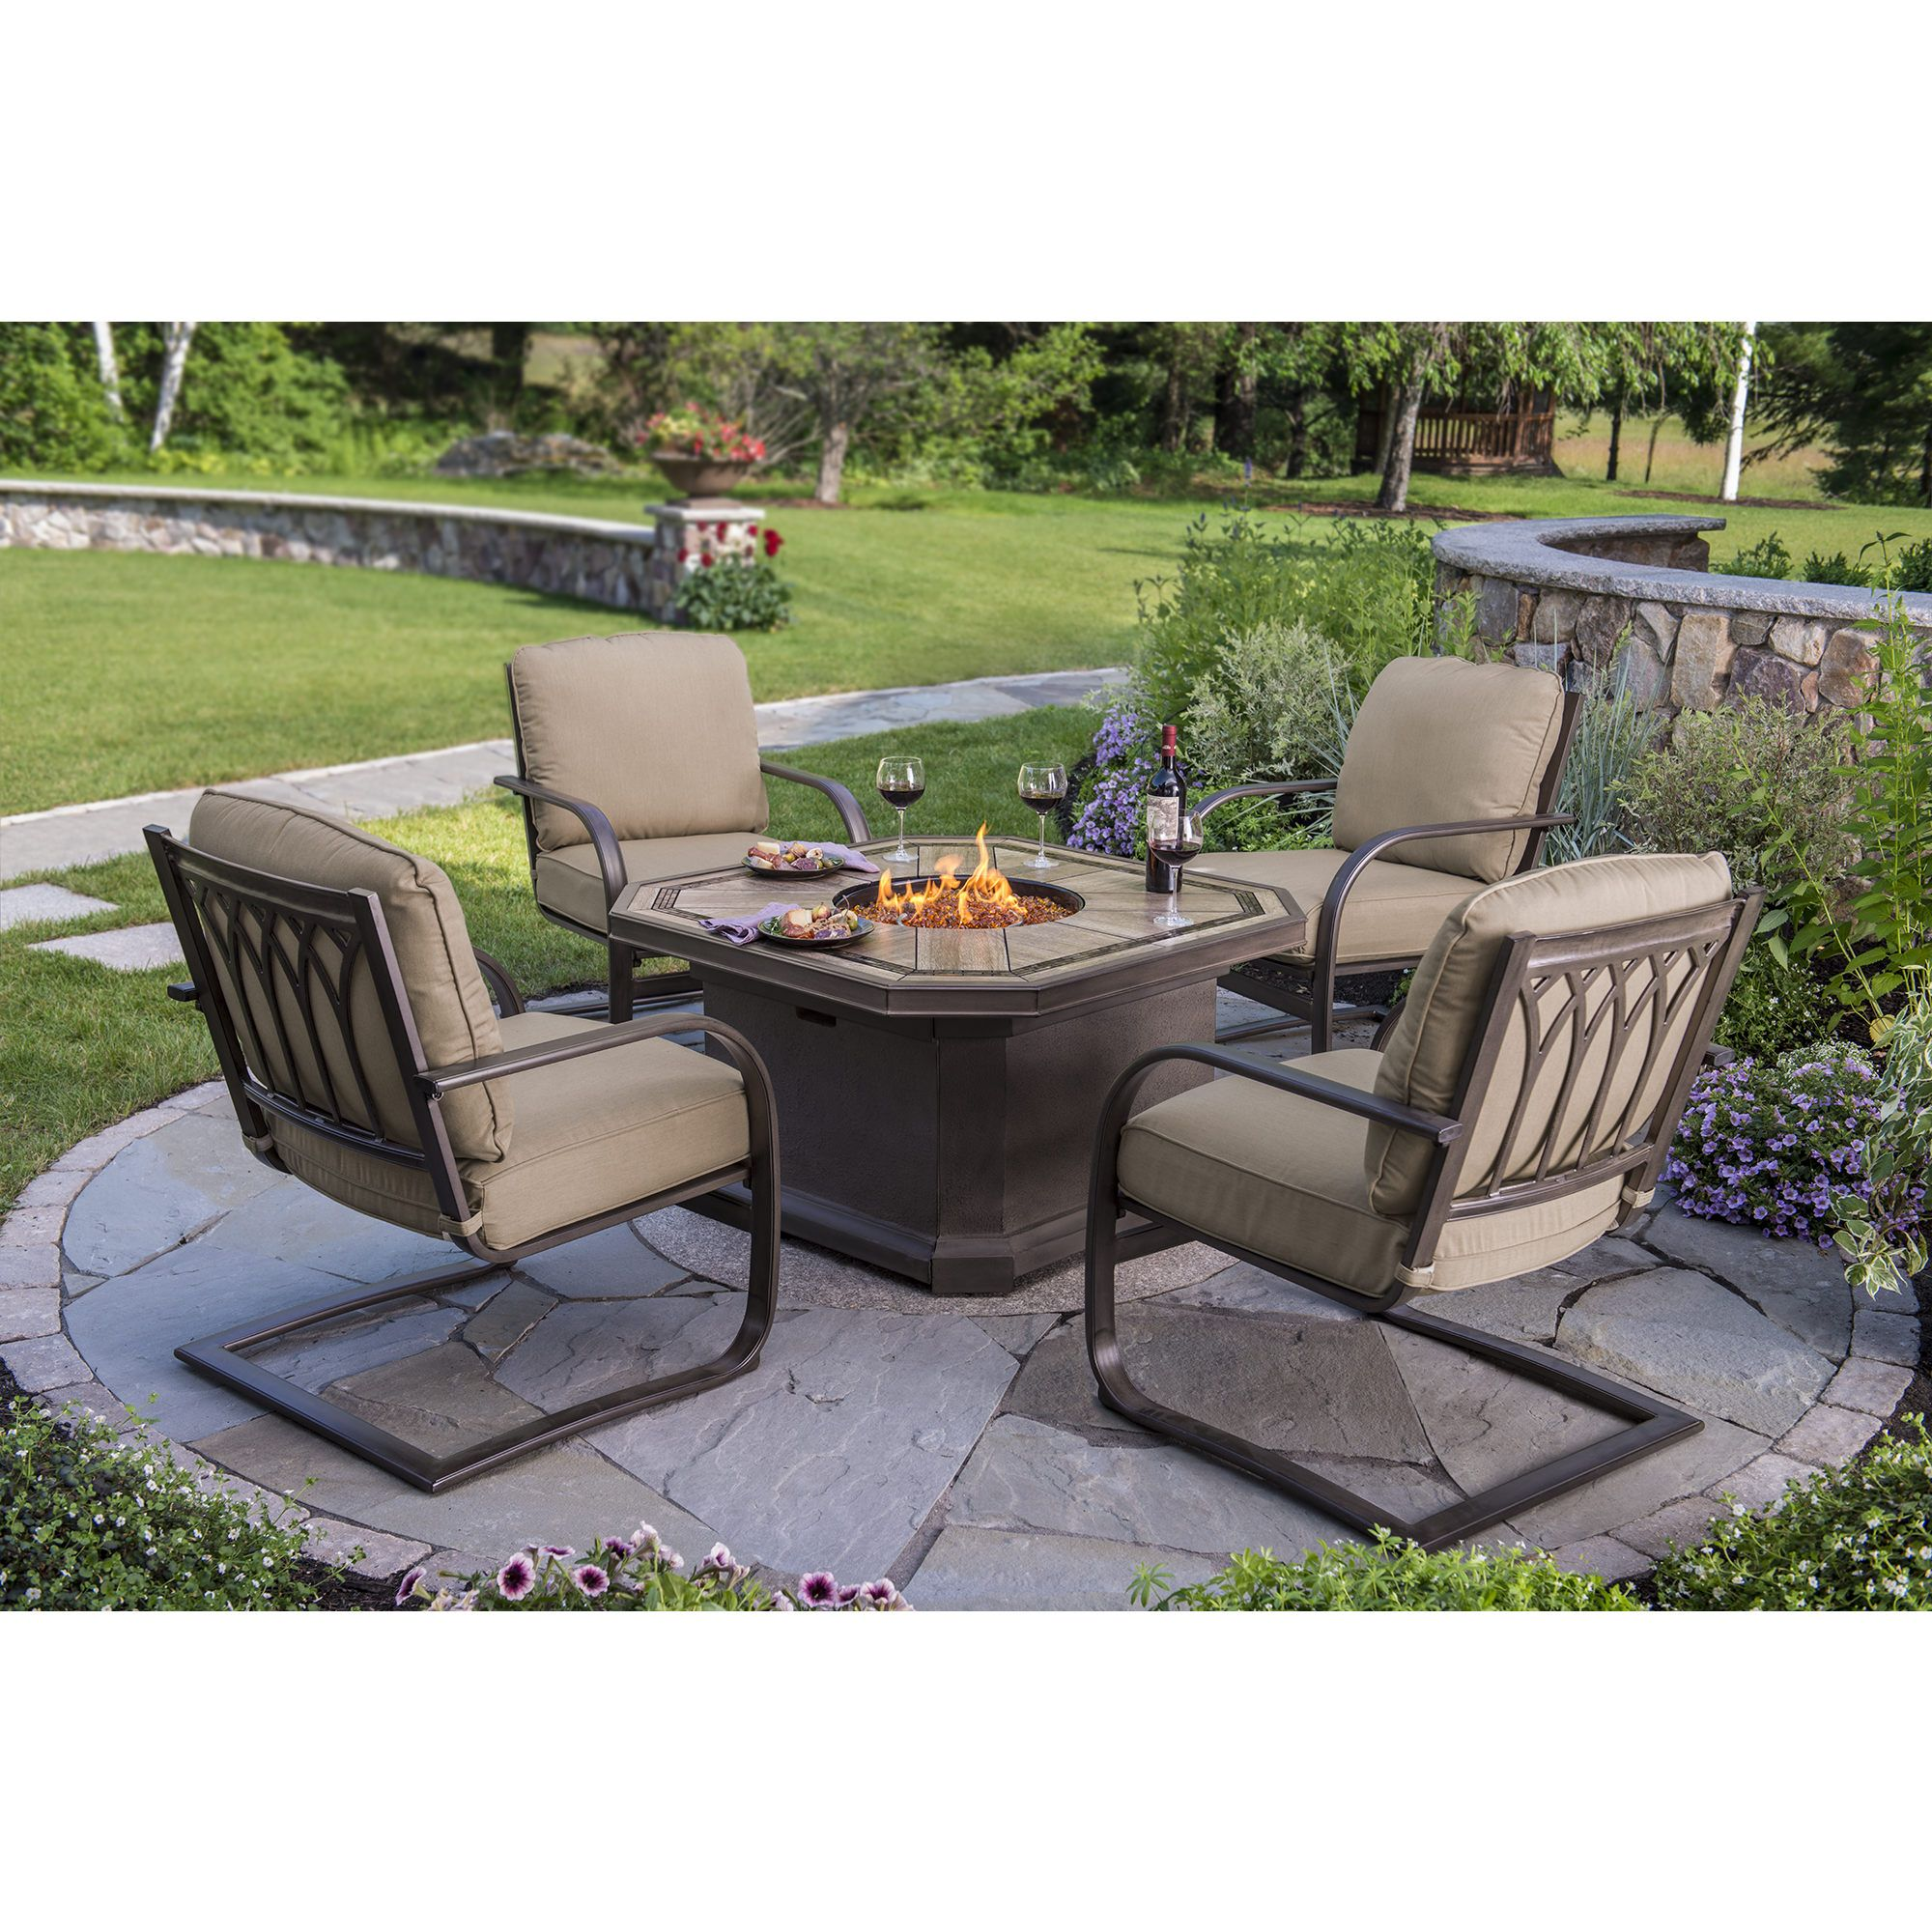 berkley jensen 5 piece fire pit set with spring cushions outdoor